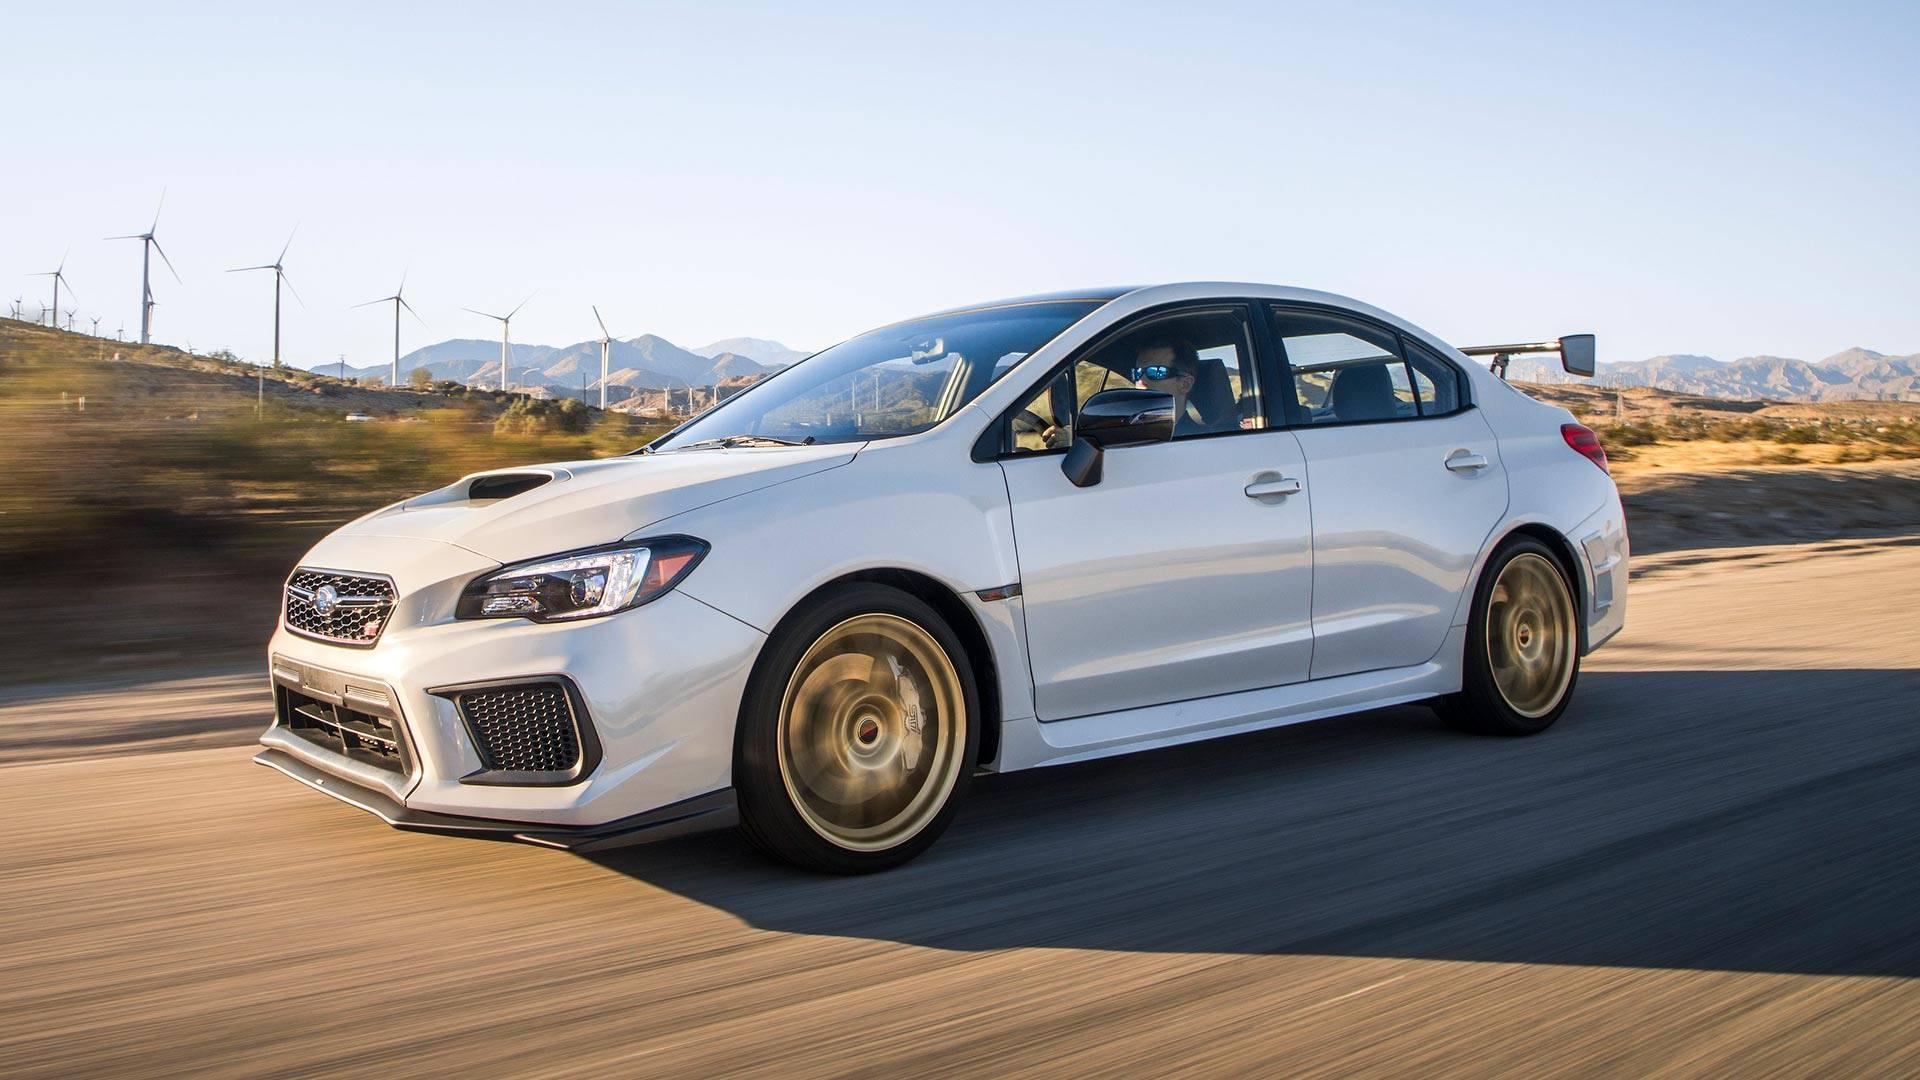 Sti Type Ra >> 2018 Subaru Wrx Sti Type Ra First Drive Lots Of Fun Lots